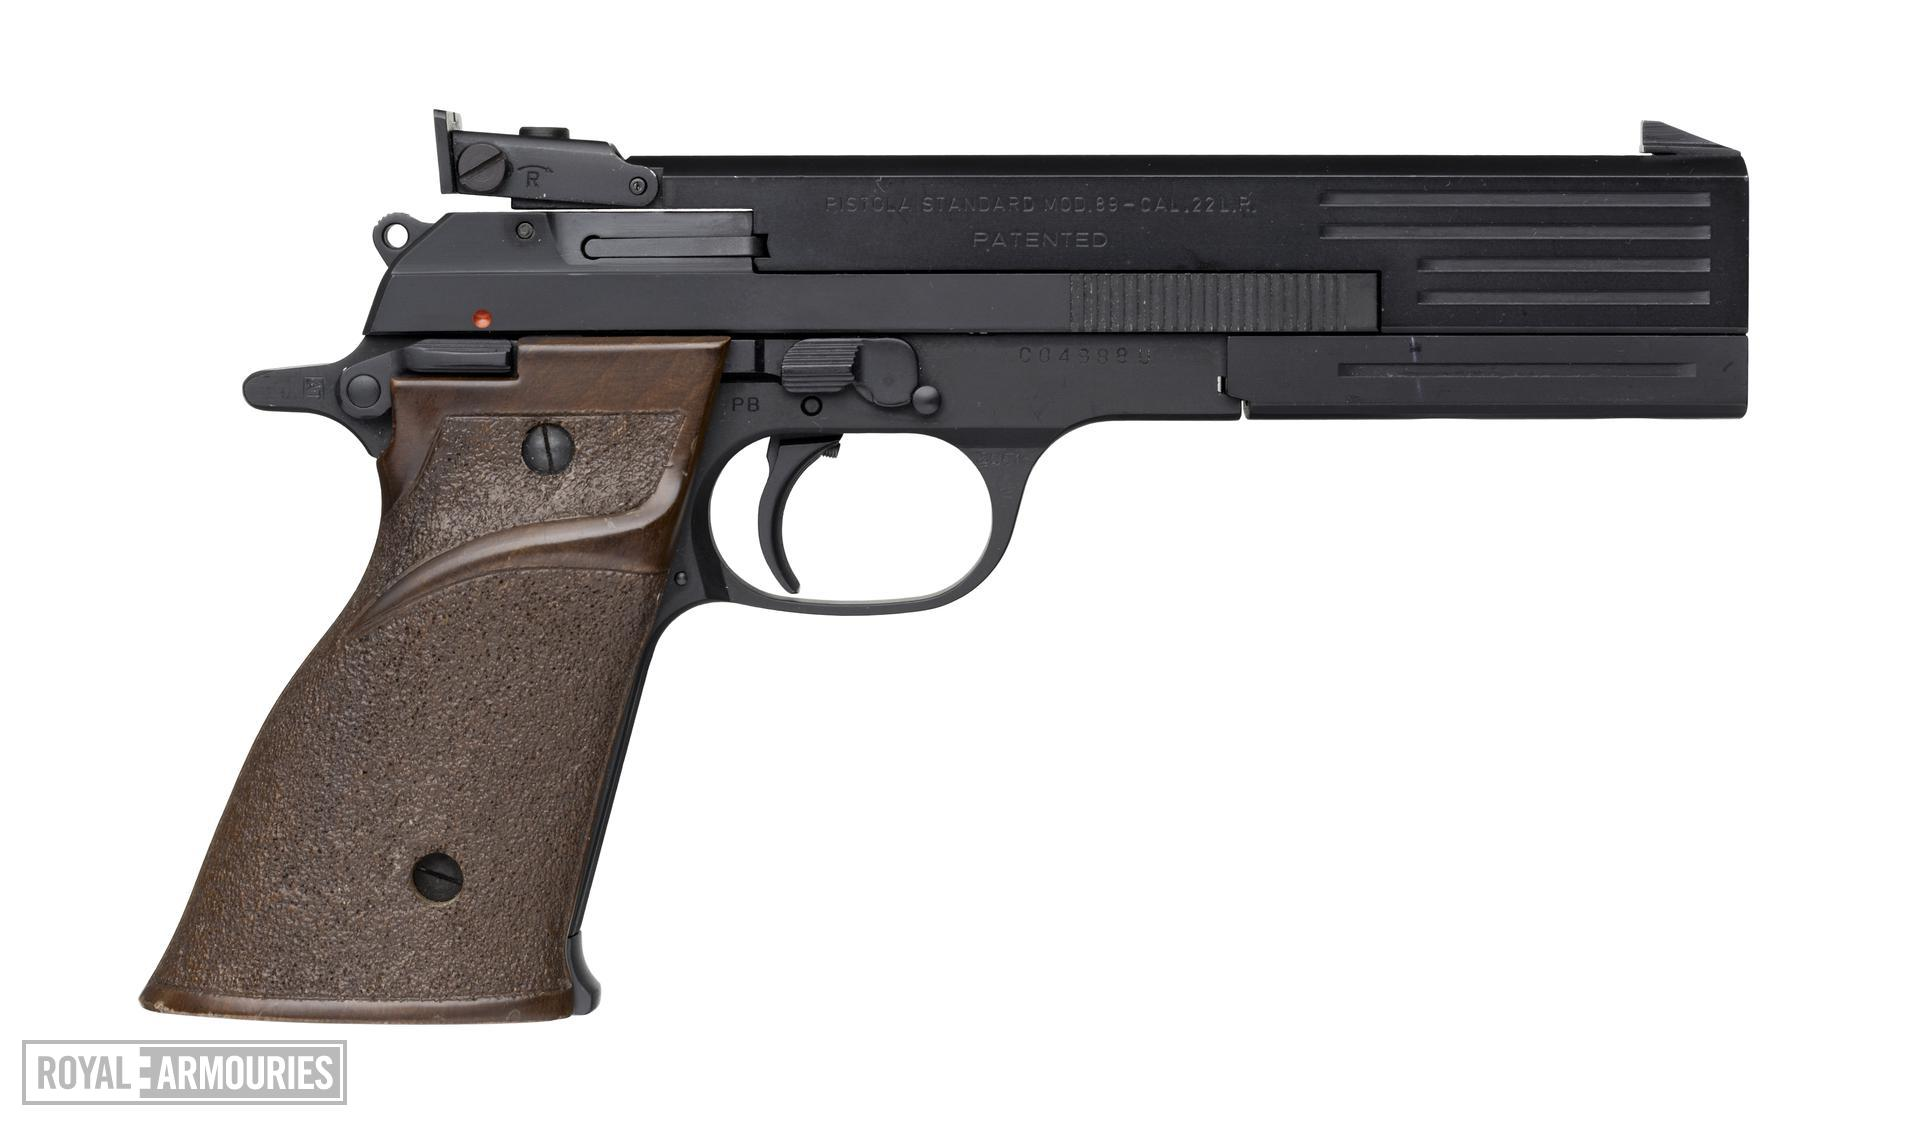 Rimfire self-loading target pistol - Beretta Model 89, Target